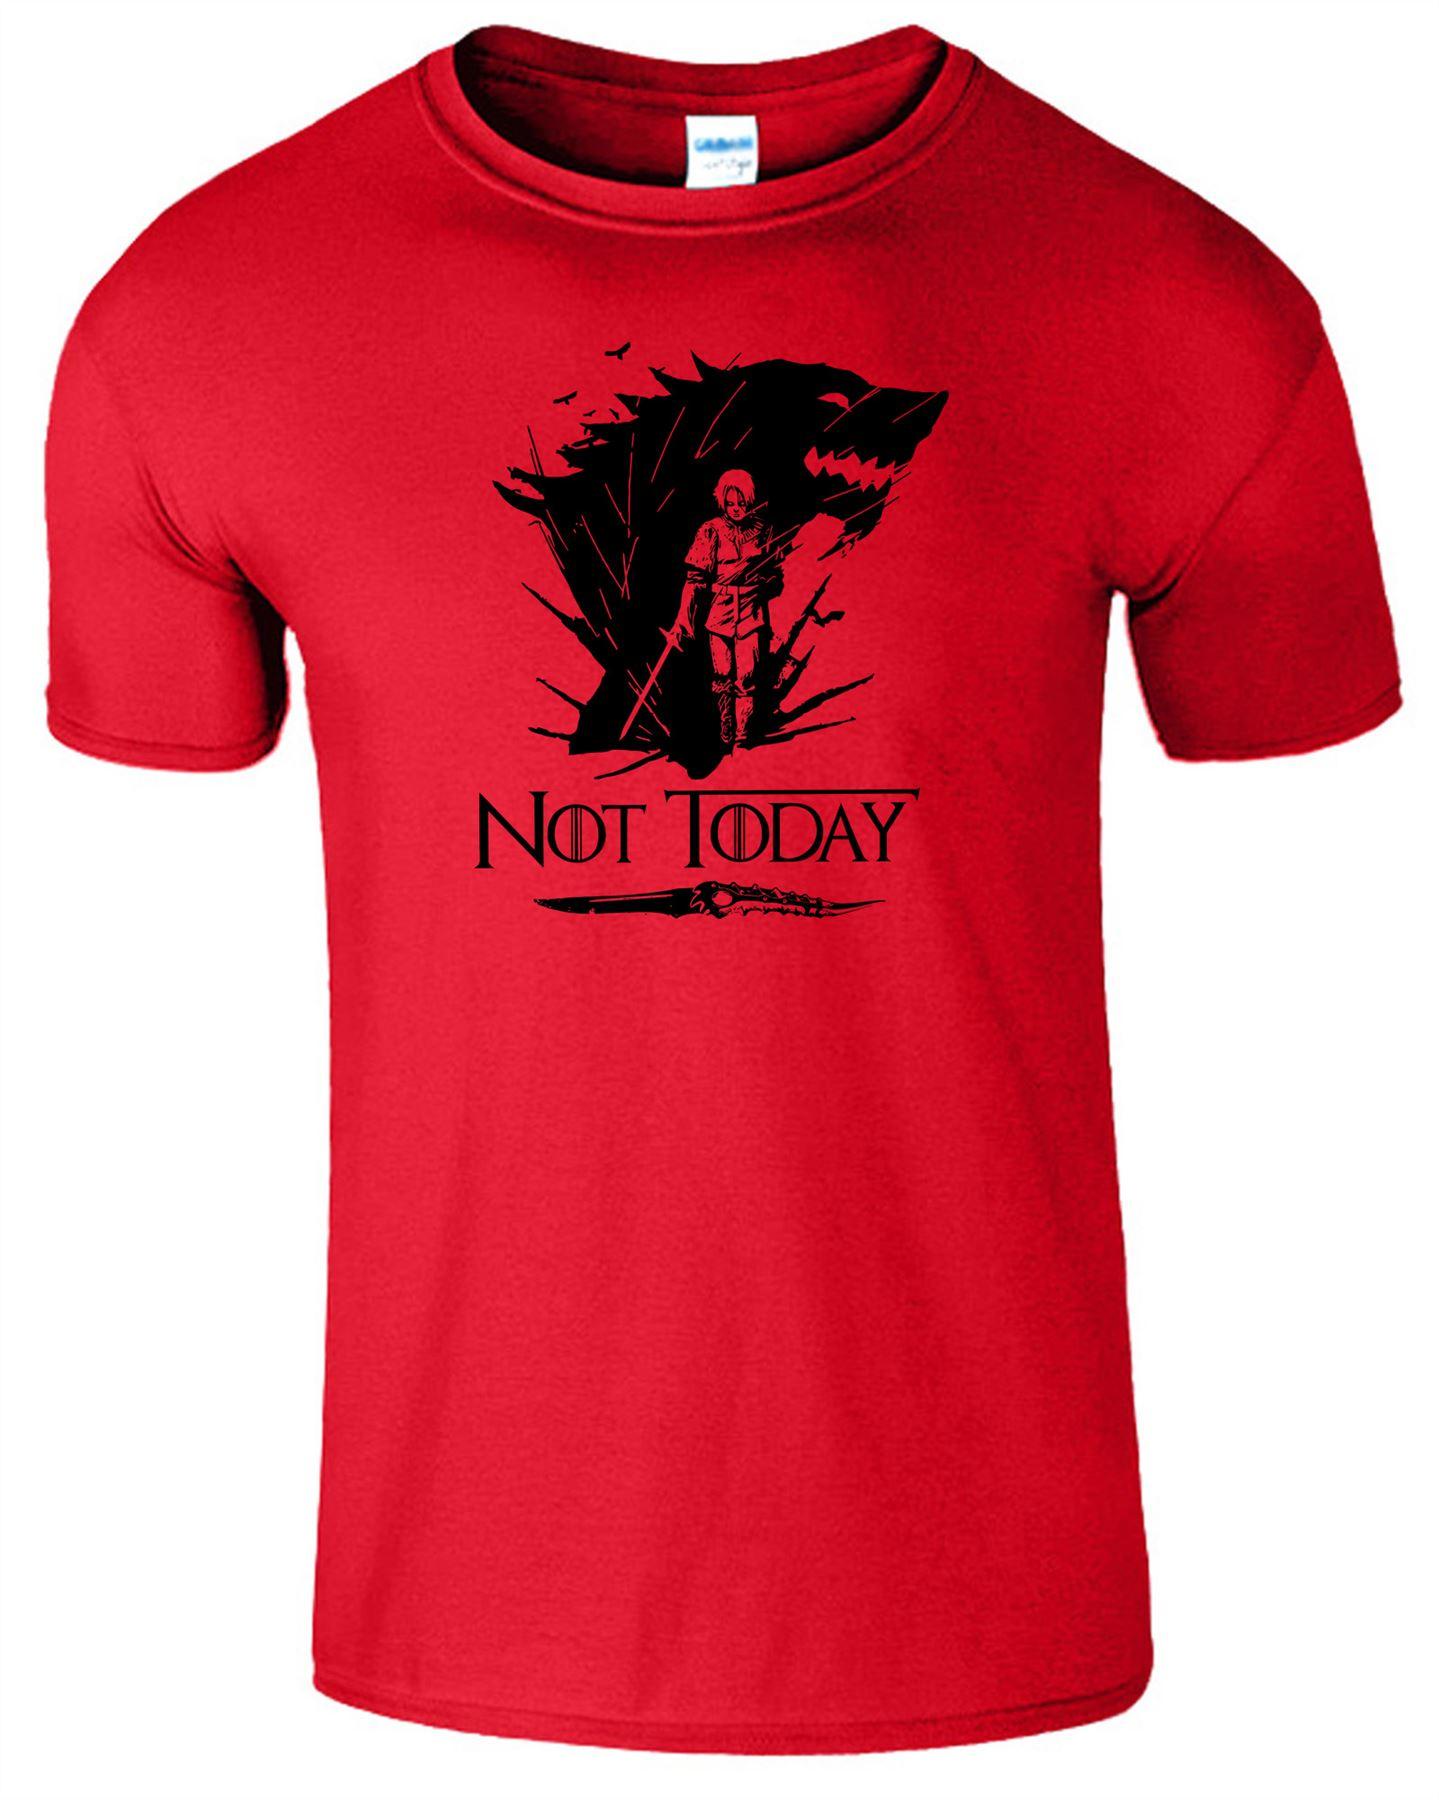 Arya-Stark-Not-Today-T-Shirt-Mens-Game-Season-Womens-Shirt-Adults-Unisex-Fit Indexbild 38